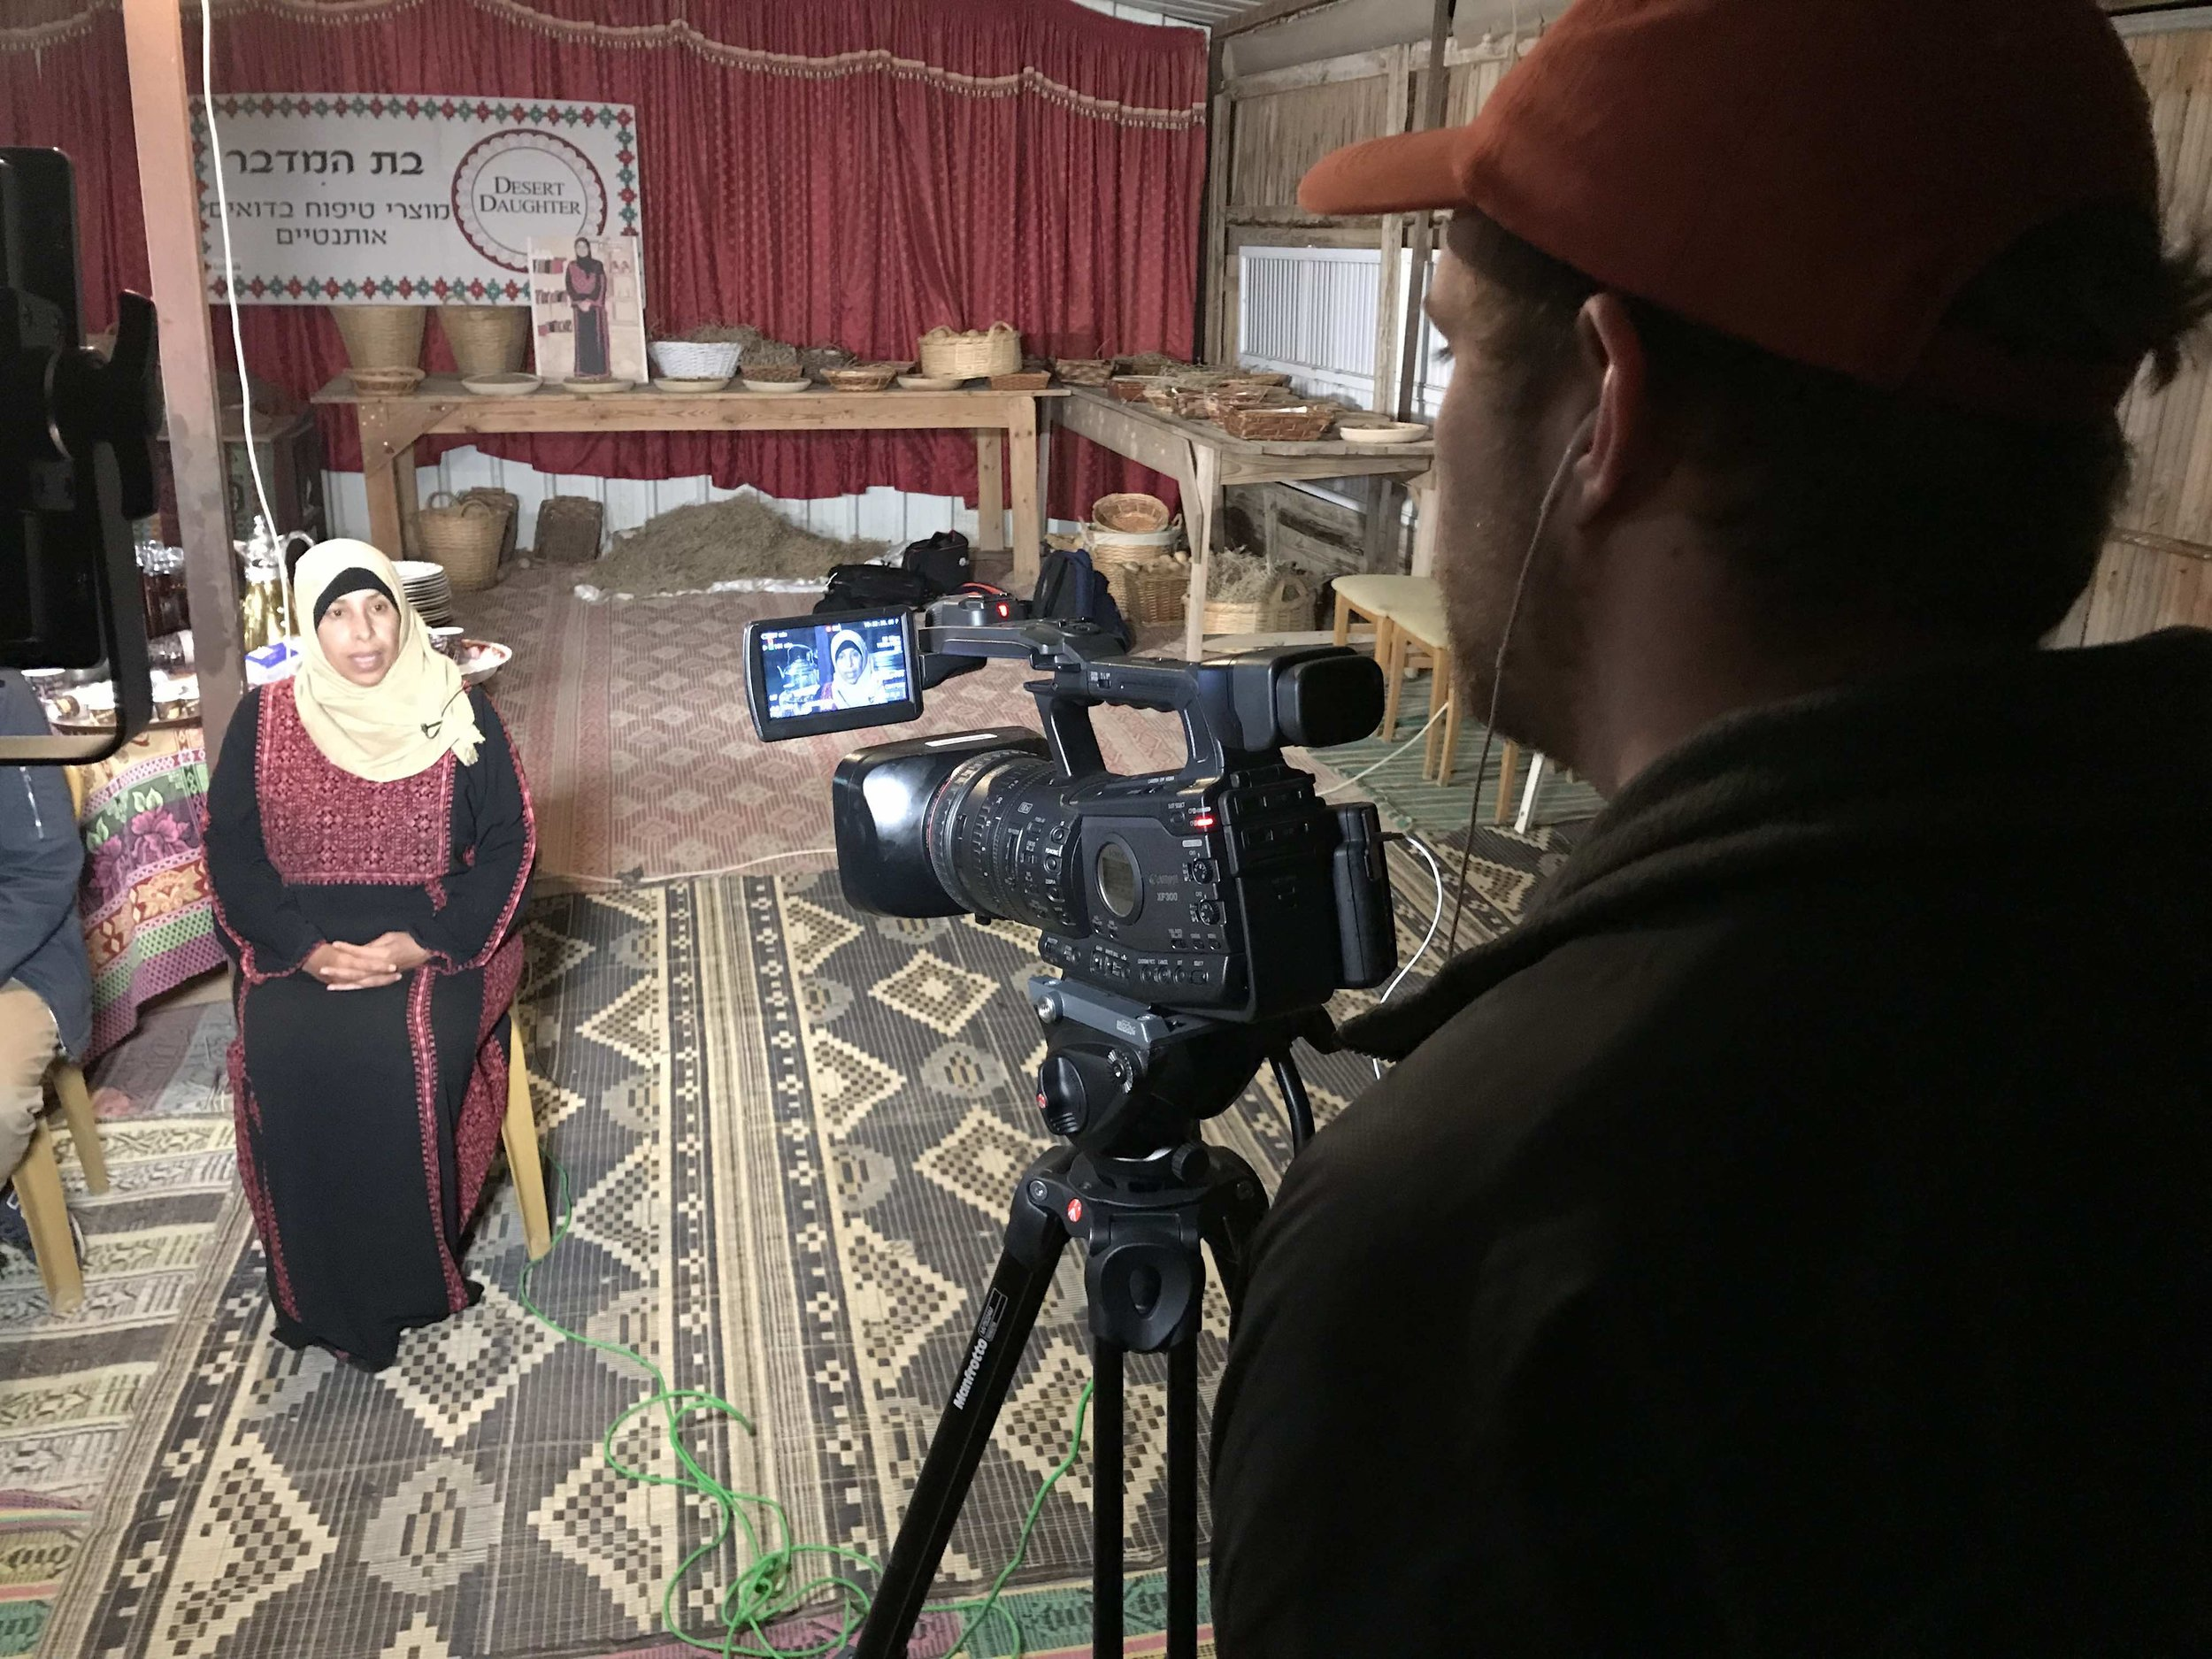 Newhouse broadcast student Nathan Dickinson interviews Bedouin woman Sohayla Abo Rkeek in Tel Sheva, Negev Desert, Israel.